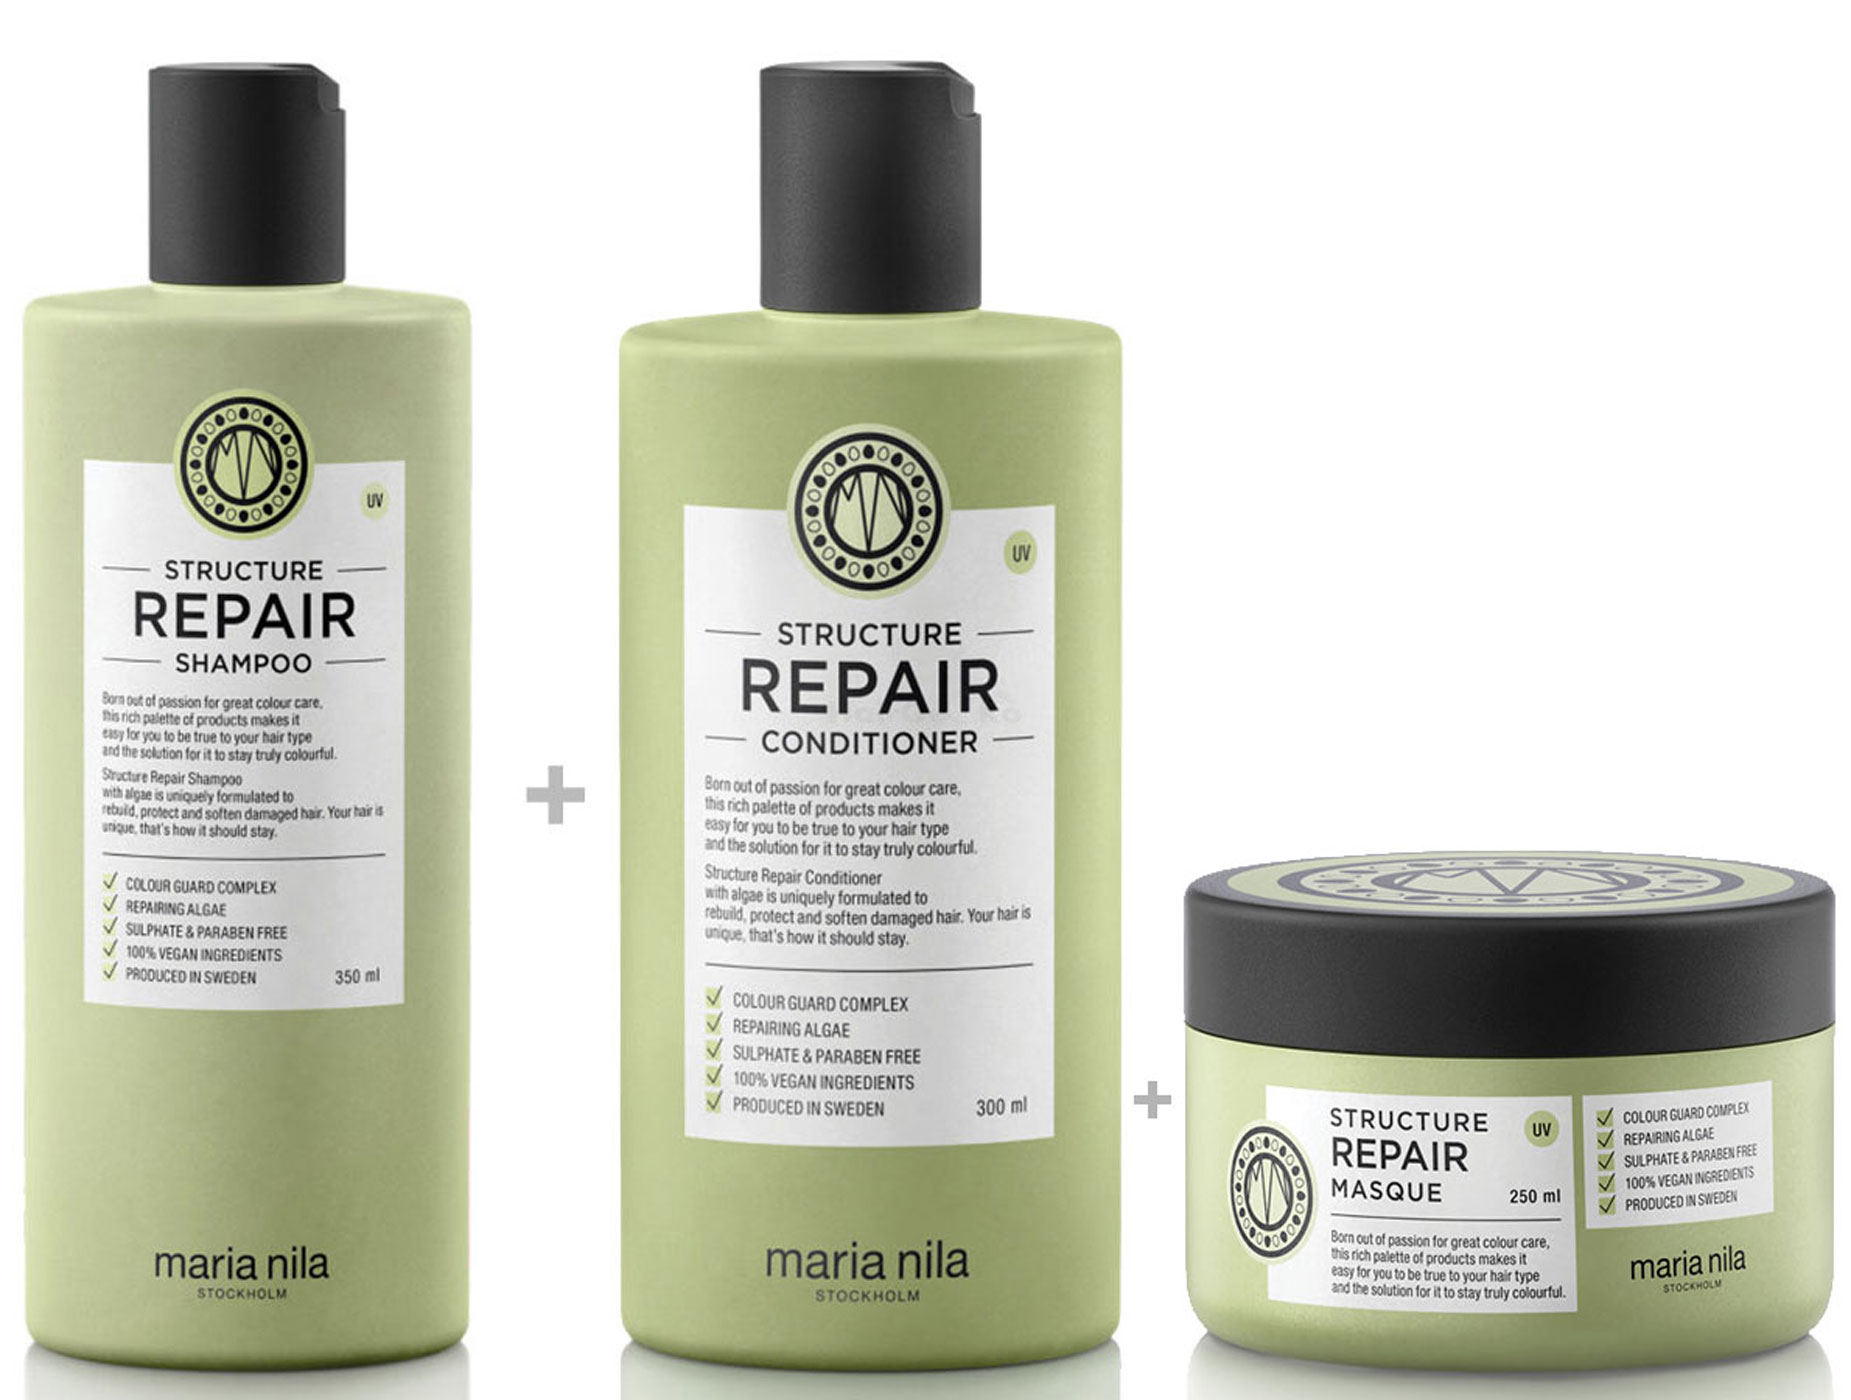 Maria Nila Structure Repair Set - Shampoo 350 ml + Conditioner 300 ml + Masque / Maske 250 ml